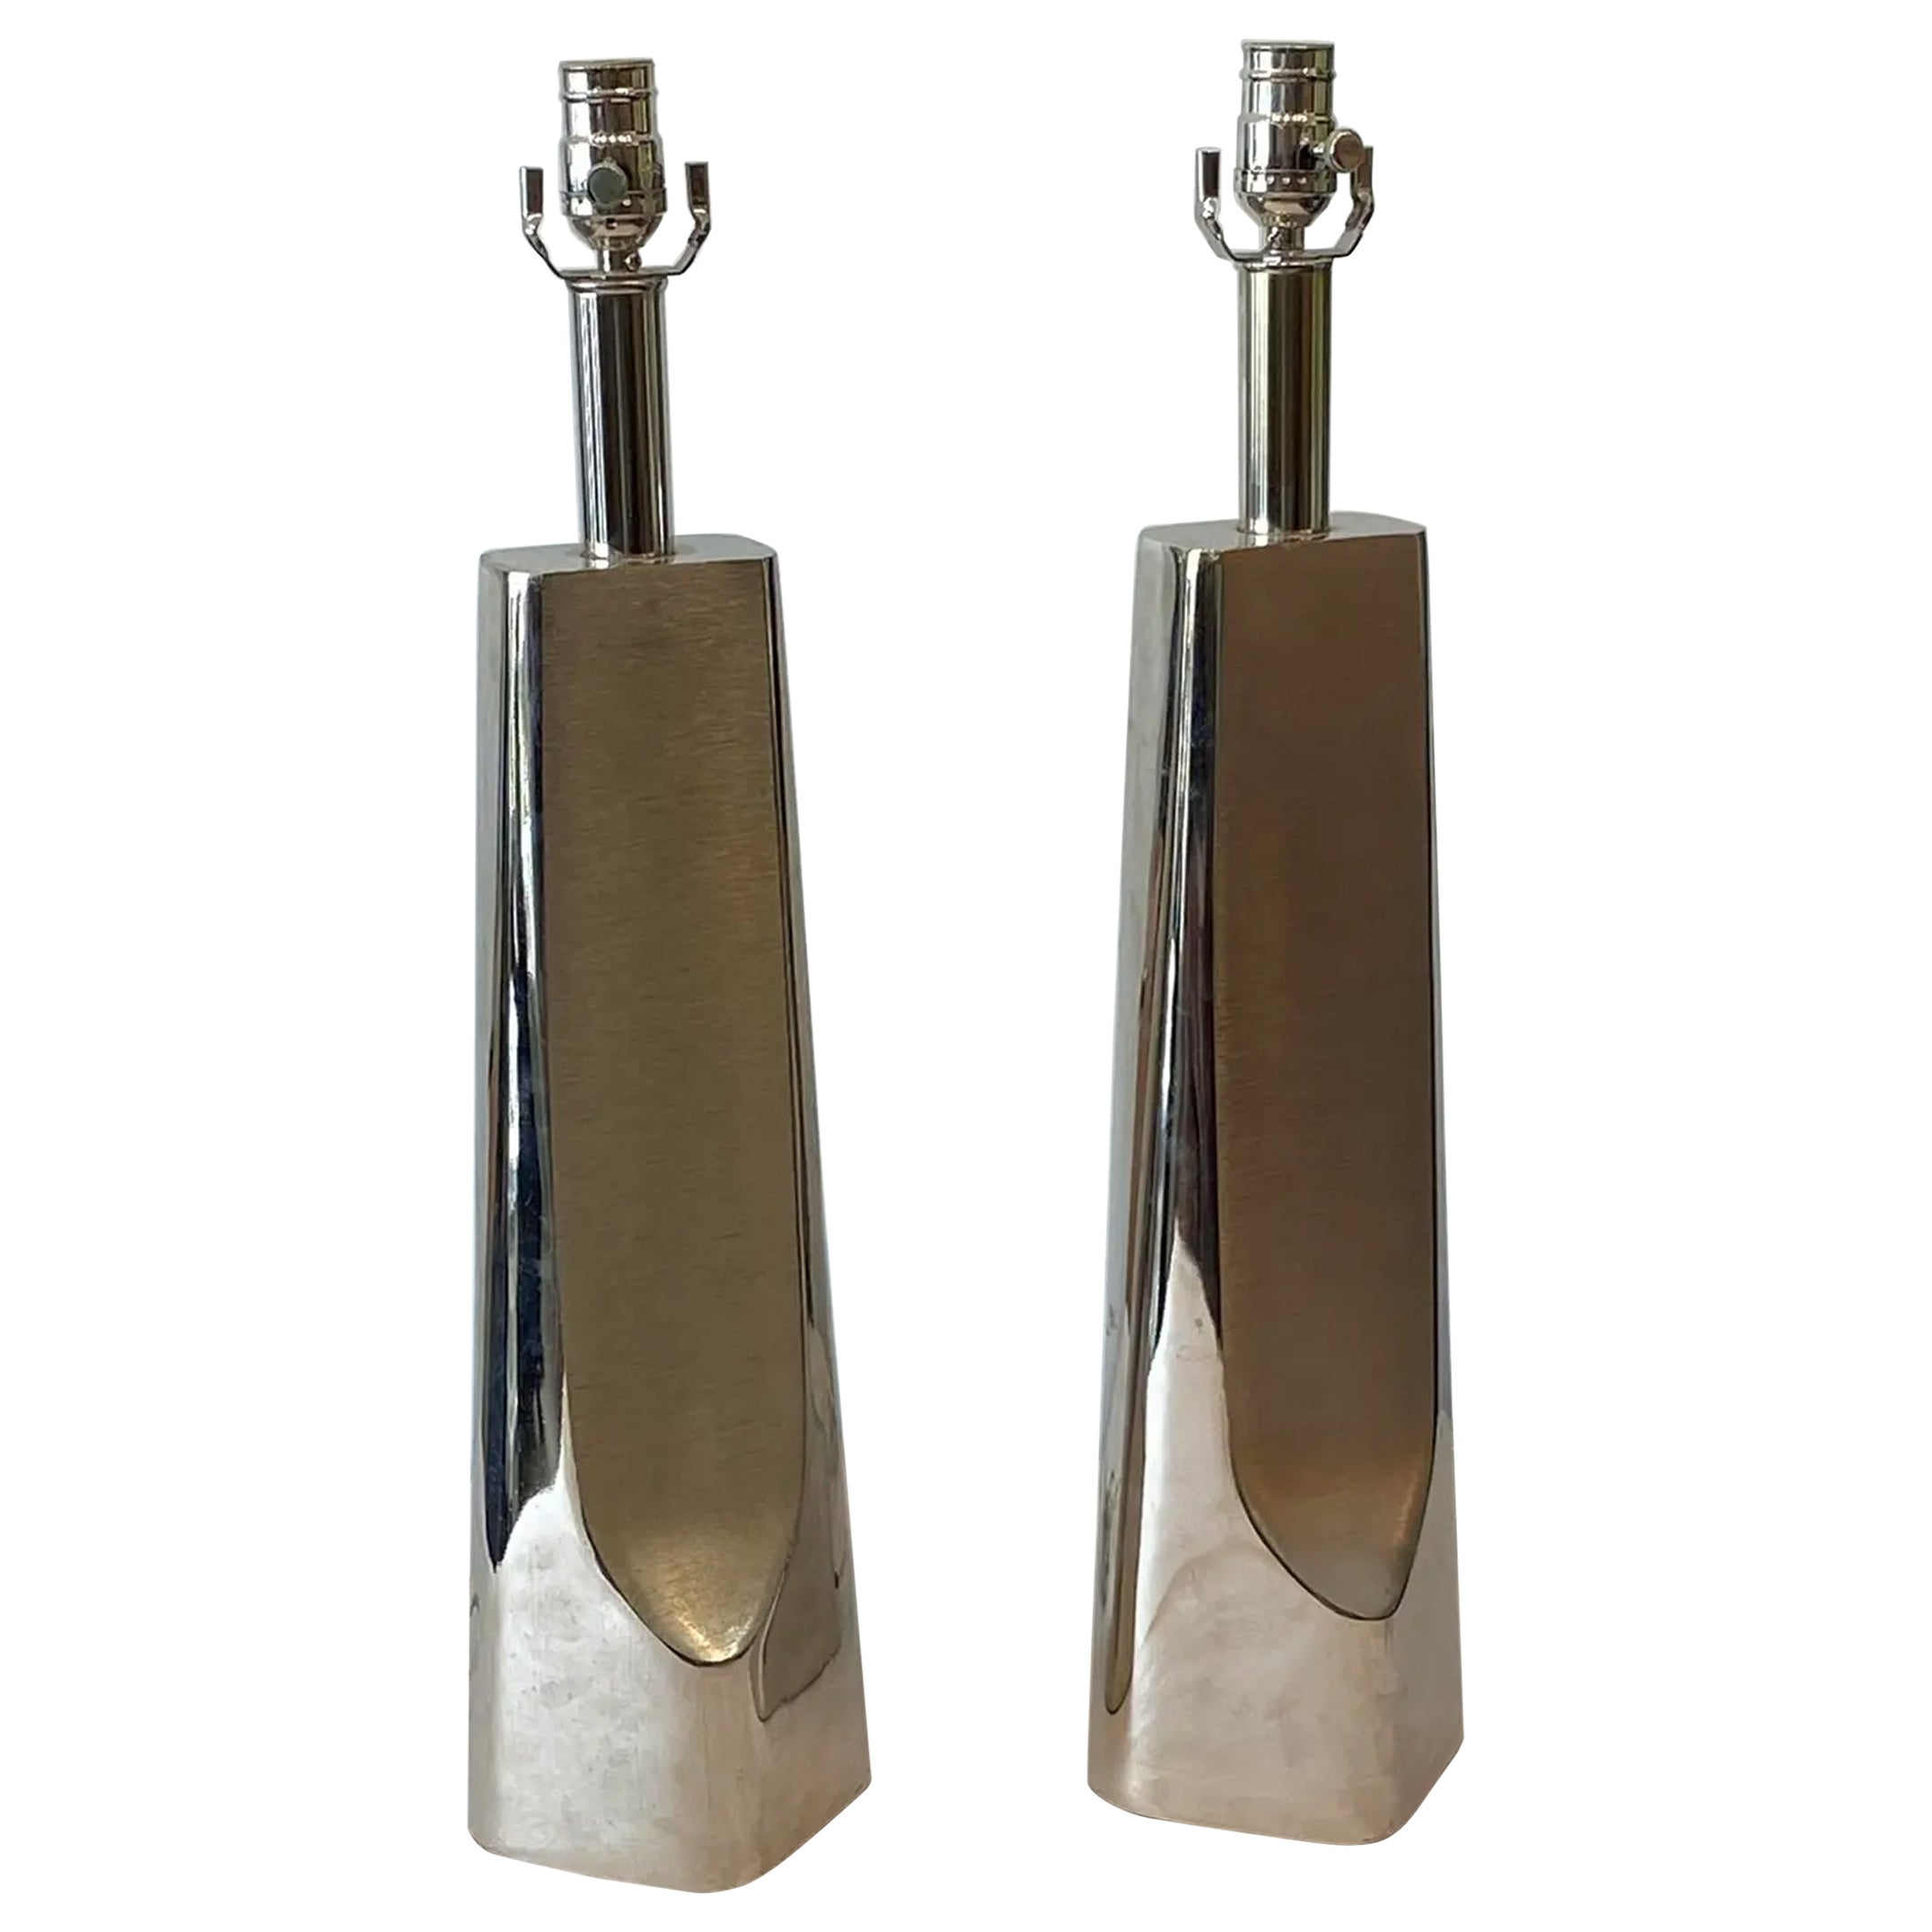 Pair of Cast Aluminum Modern Lamps by Laurel Lamp Co